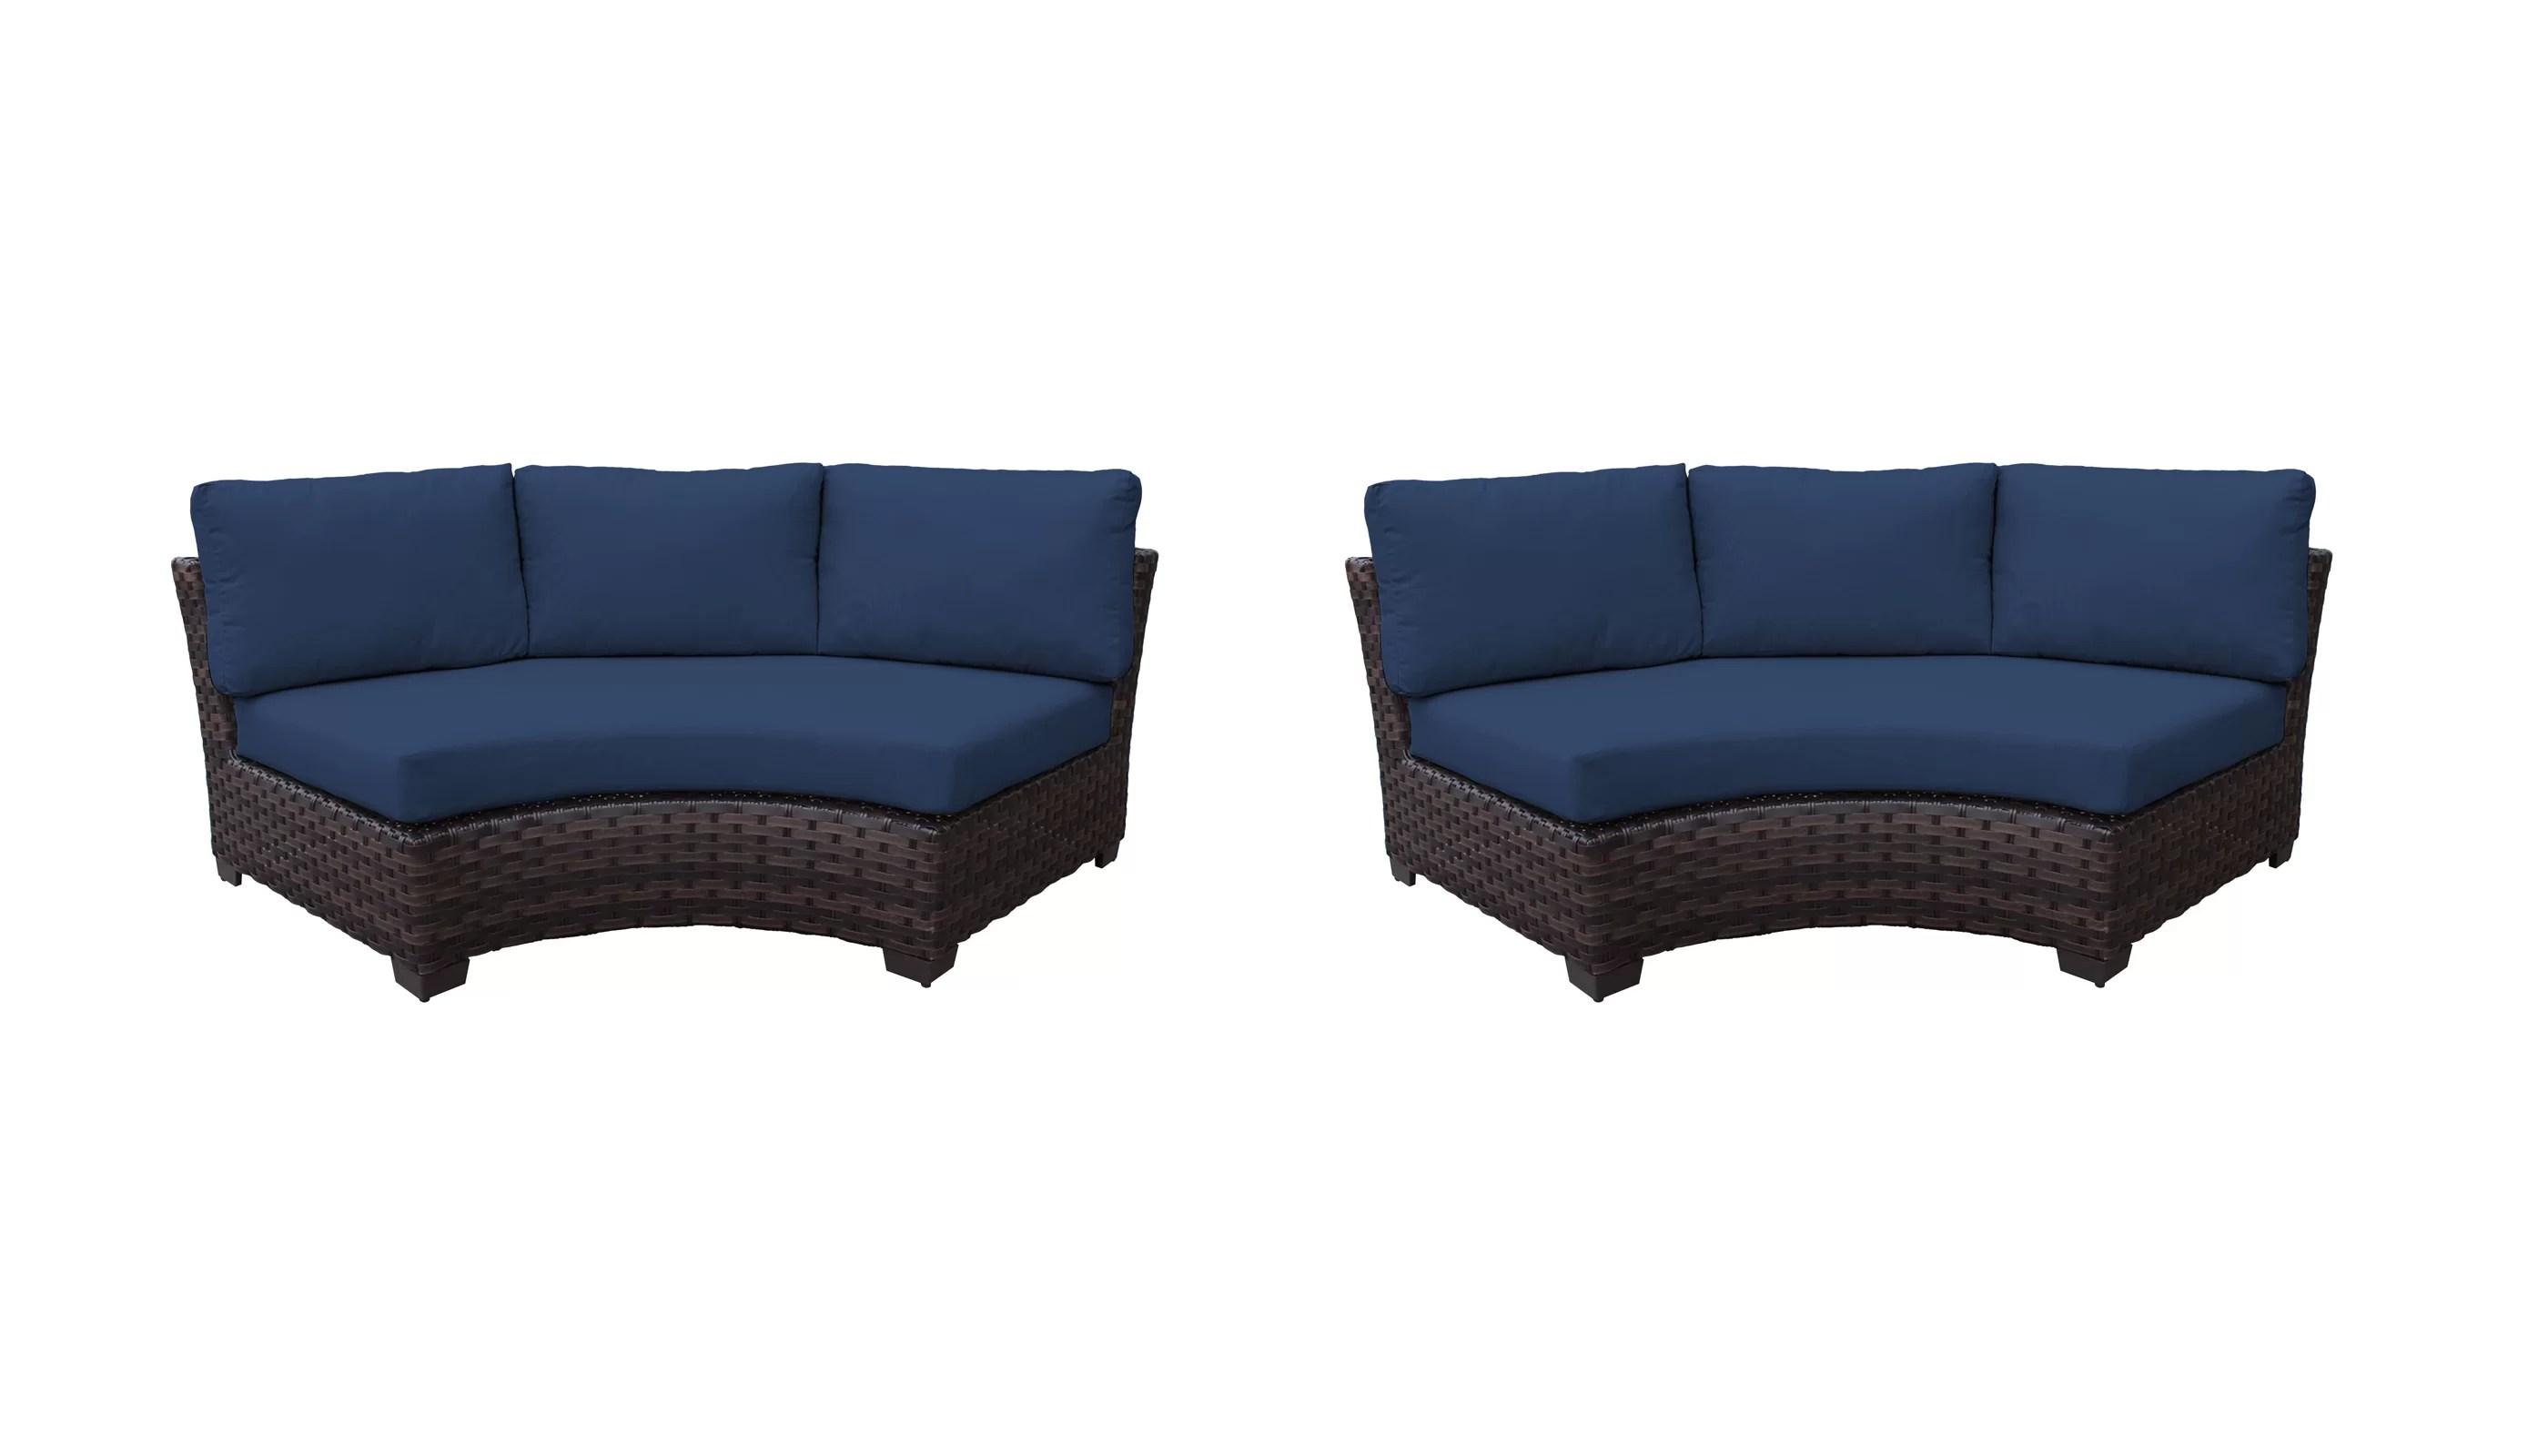 kathy ireland homes gardens river brook curved armless sofa 2 per box patio chair